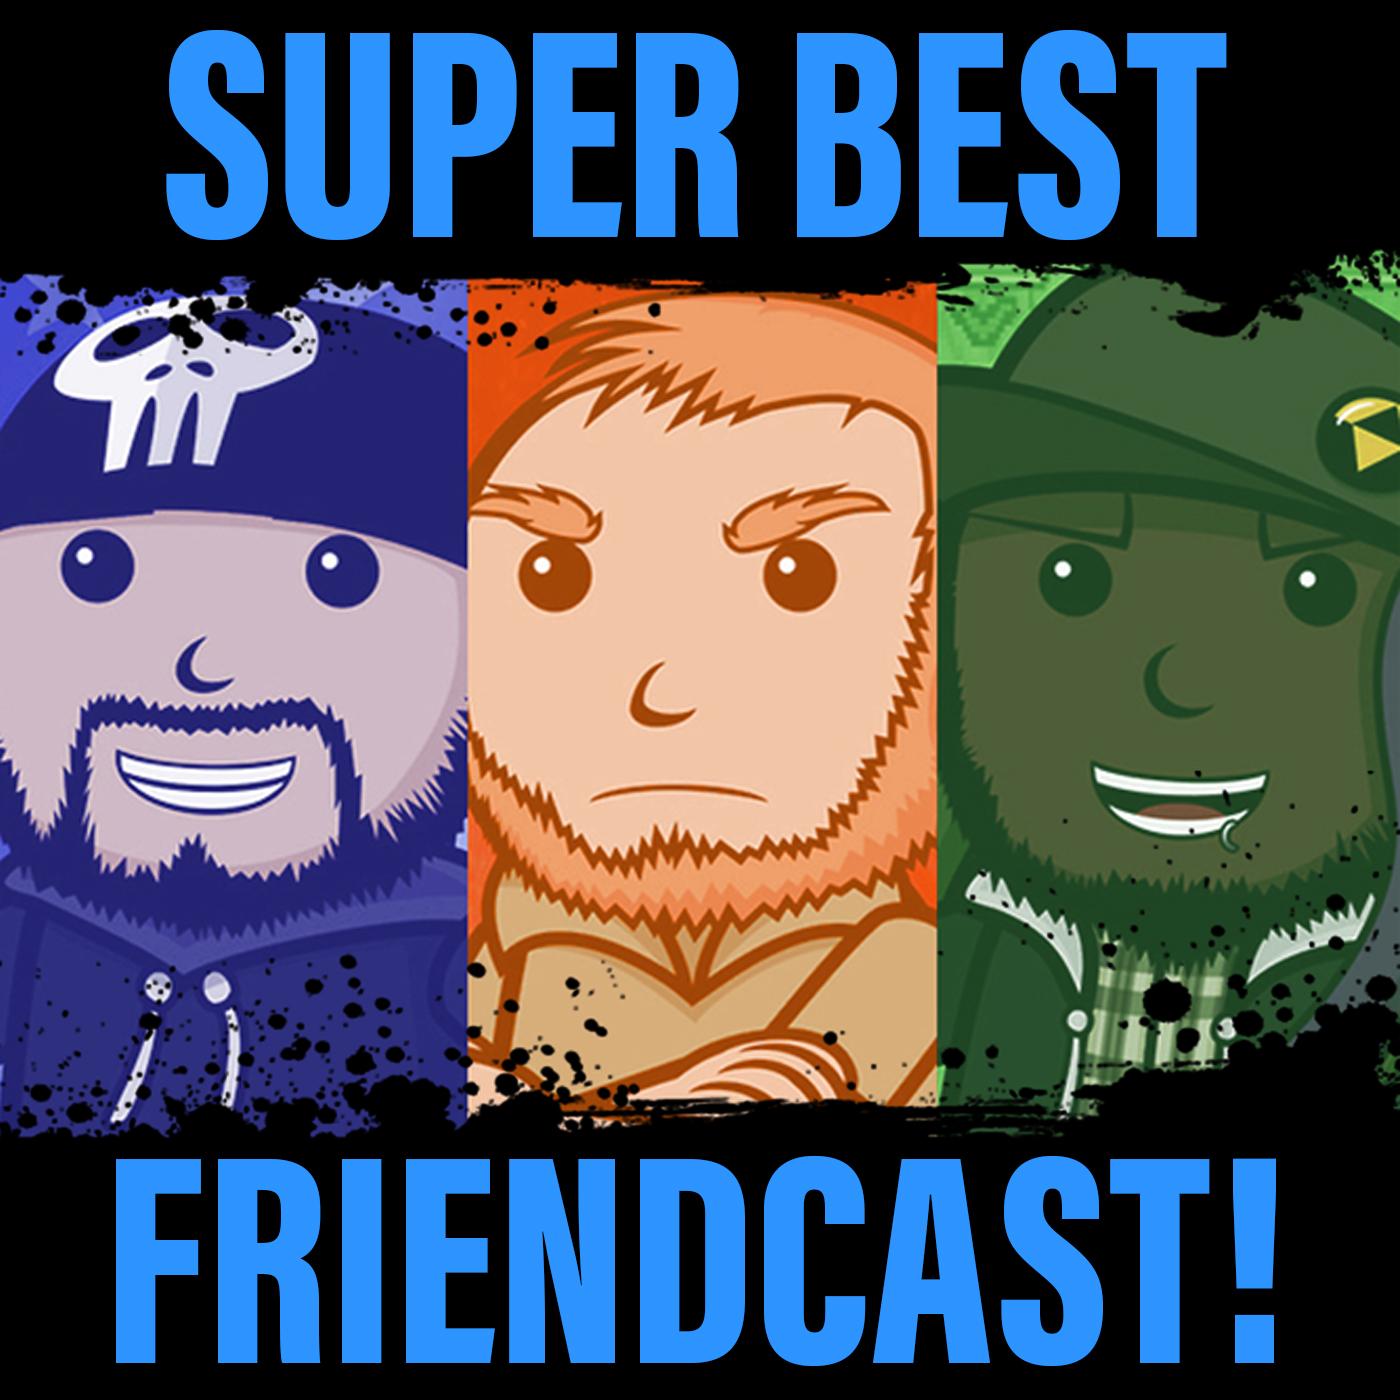 Super Best Friendcast! logo